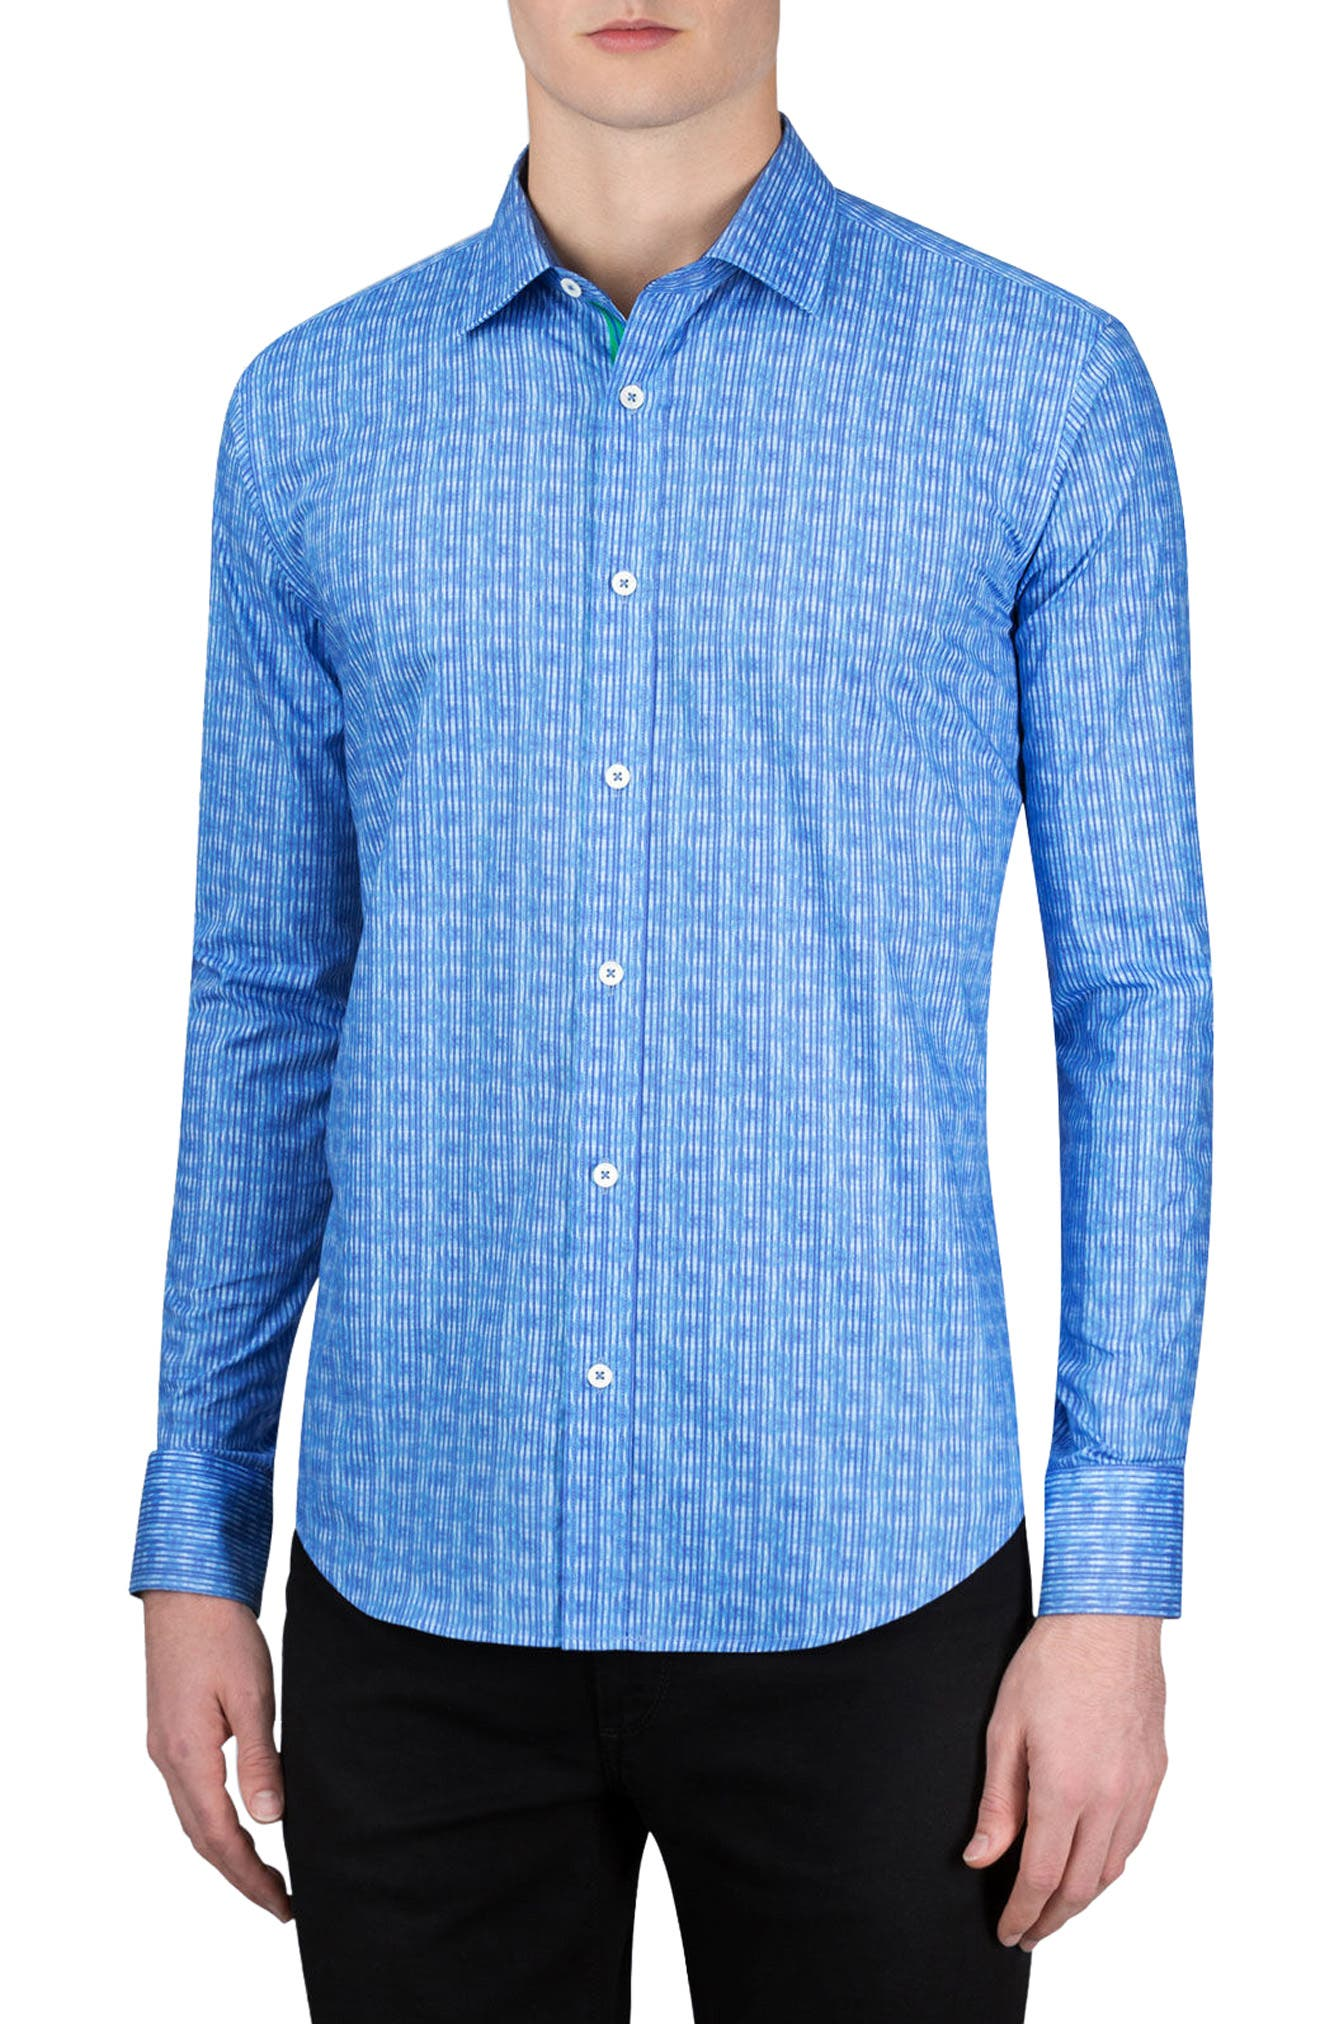 Alternate Image 1 Selected - Bugatchi Shaped Fit Stripe Sport Shirt